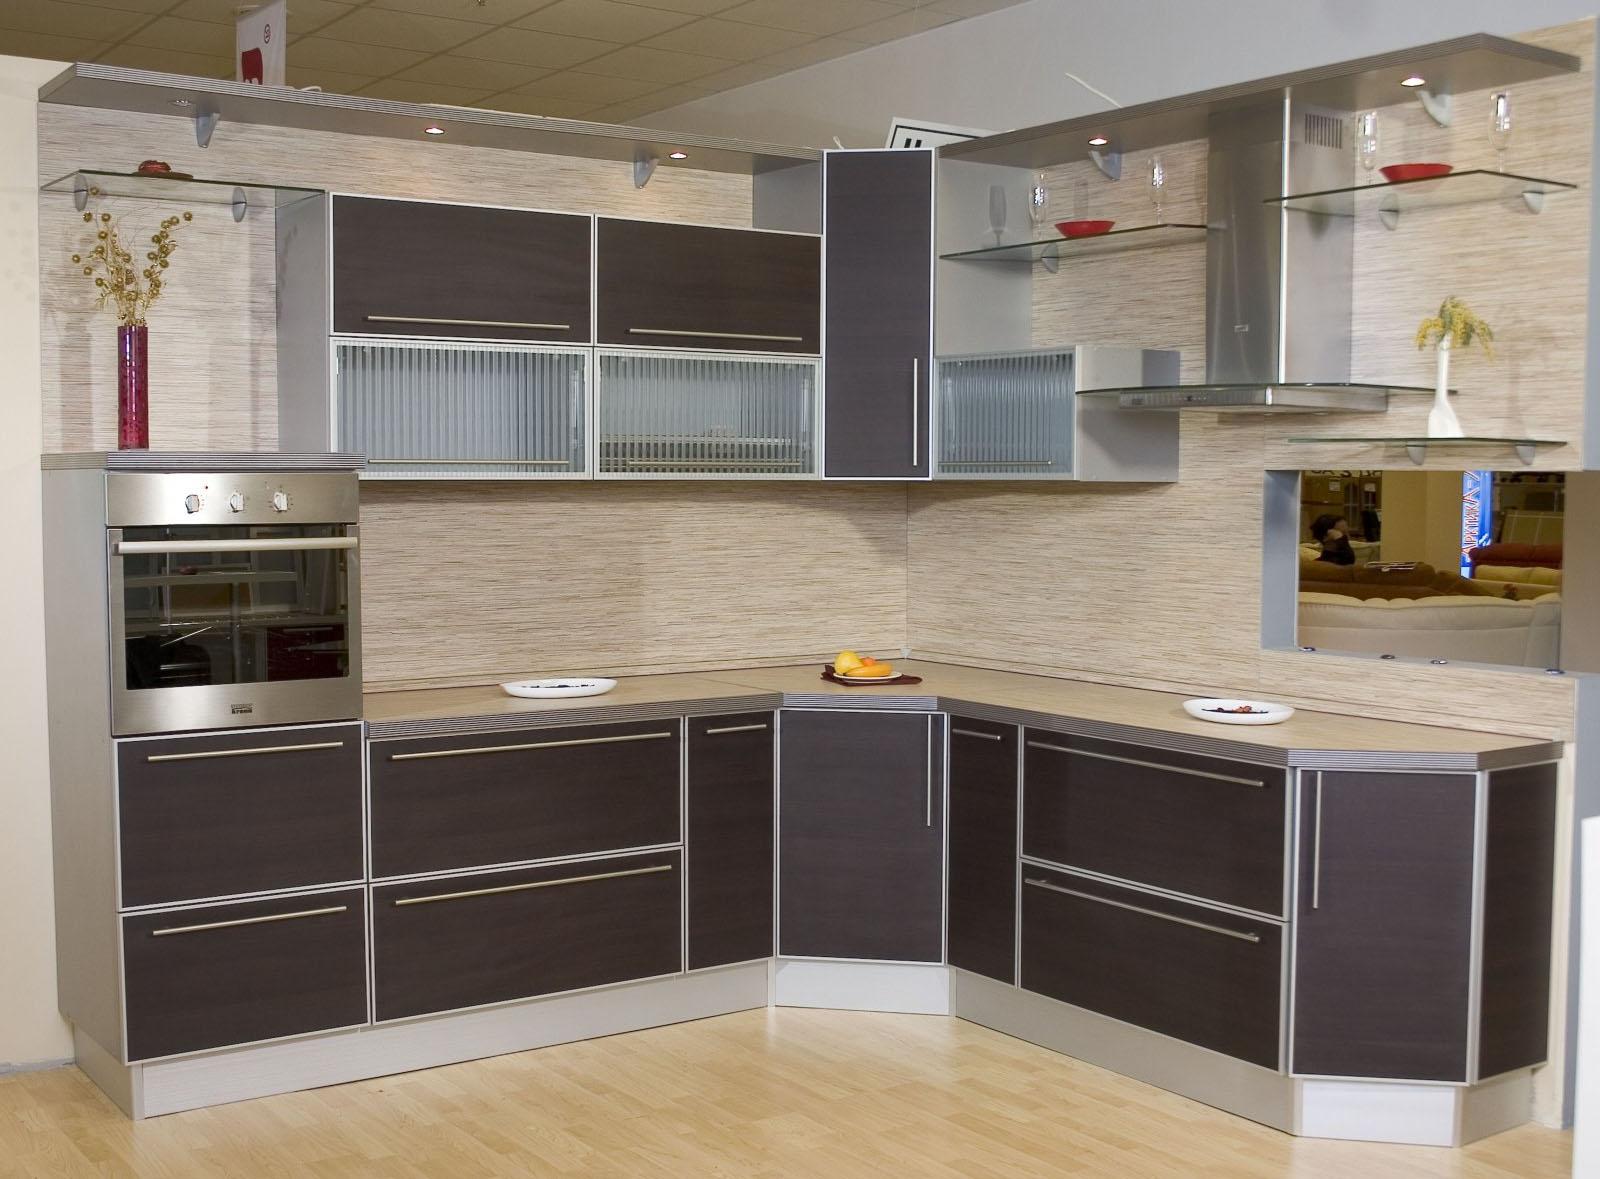 Фасады для кухни: советы специалиста